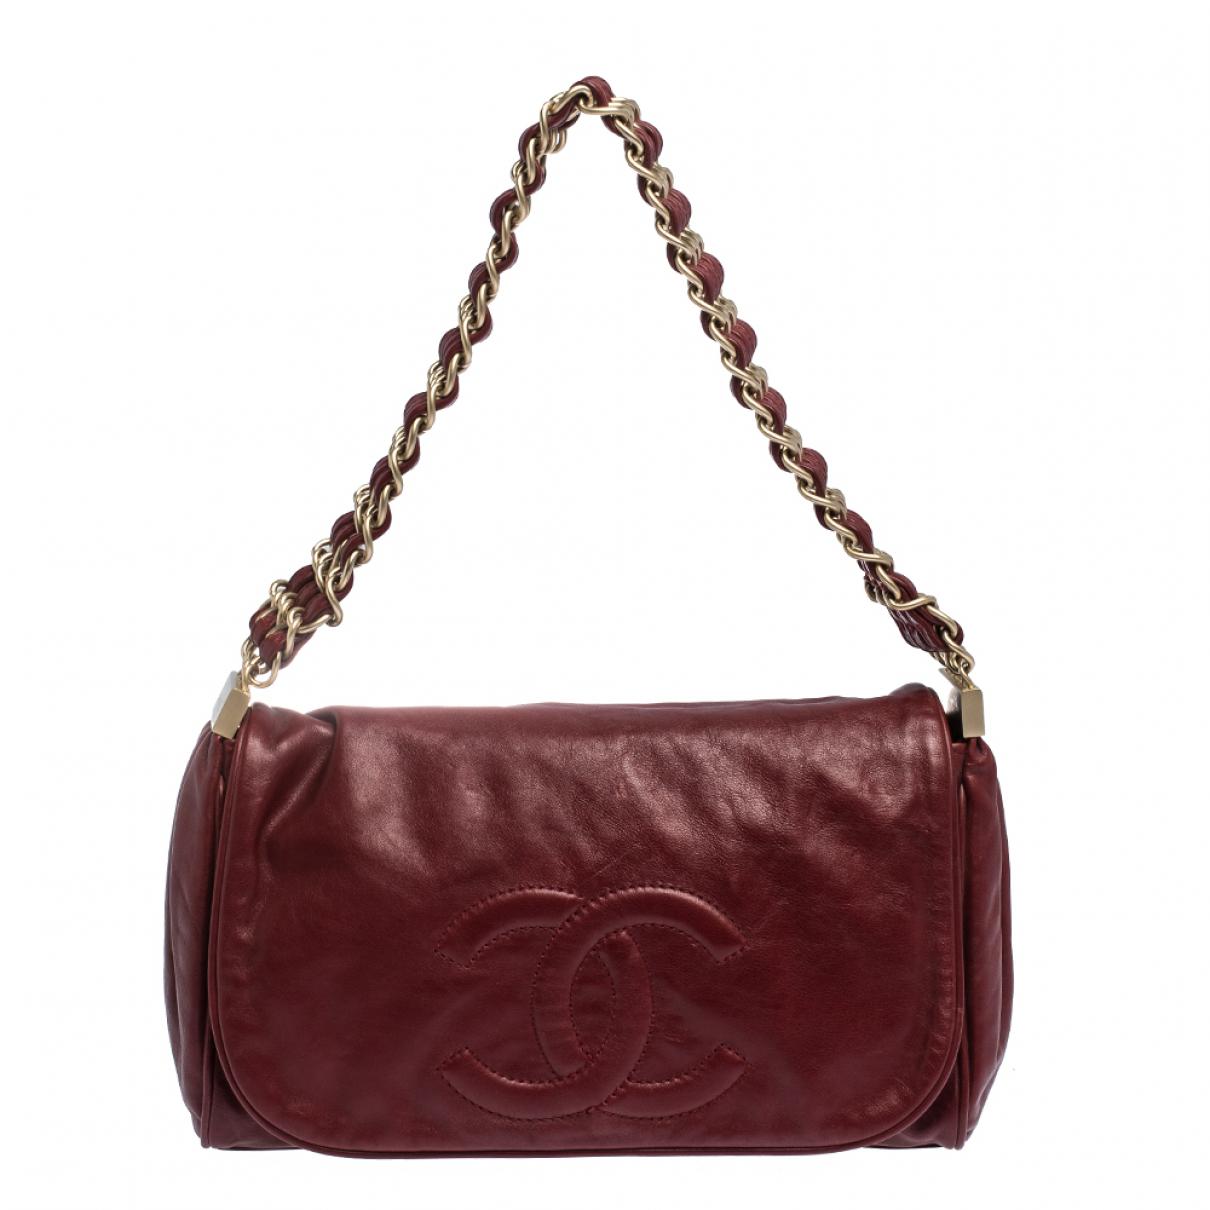 Chanel Timeless/Classique Burgundy Leather handbag for Women \N